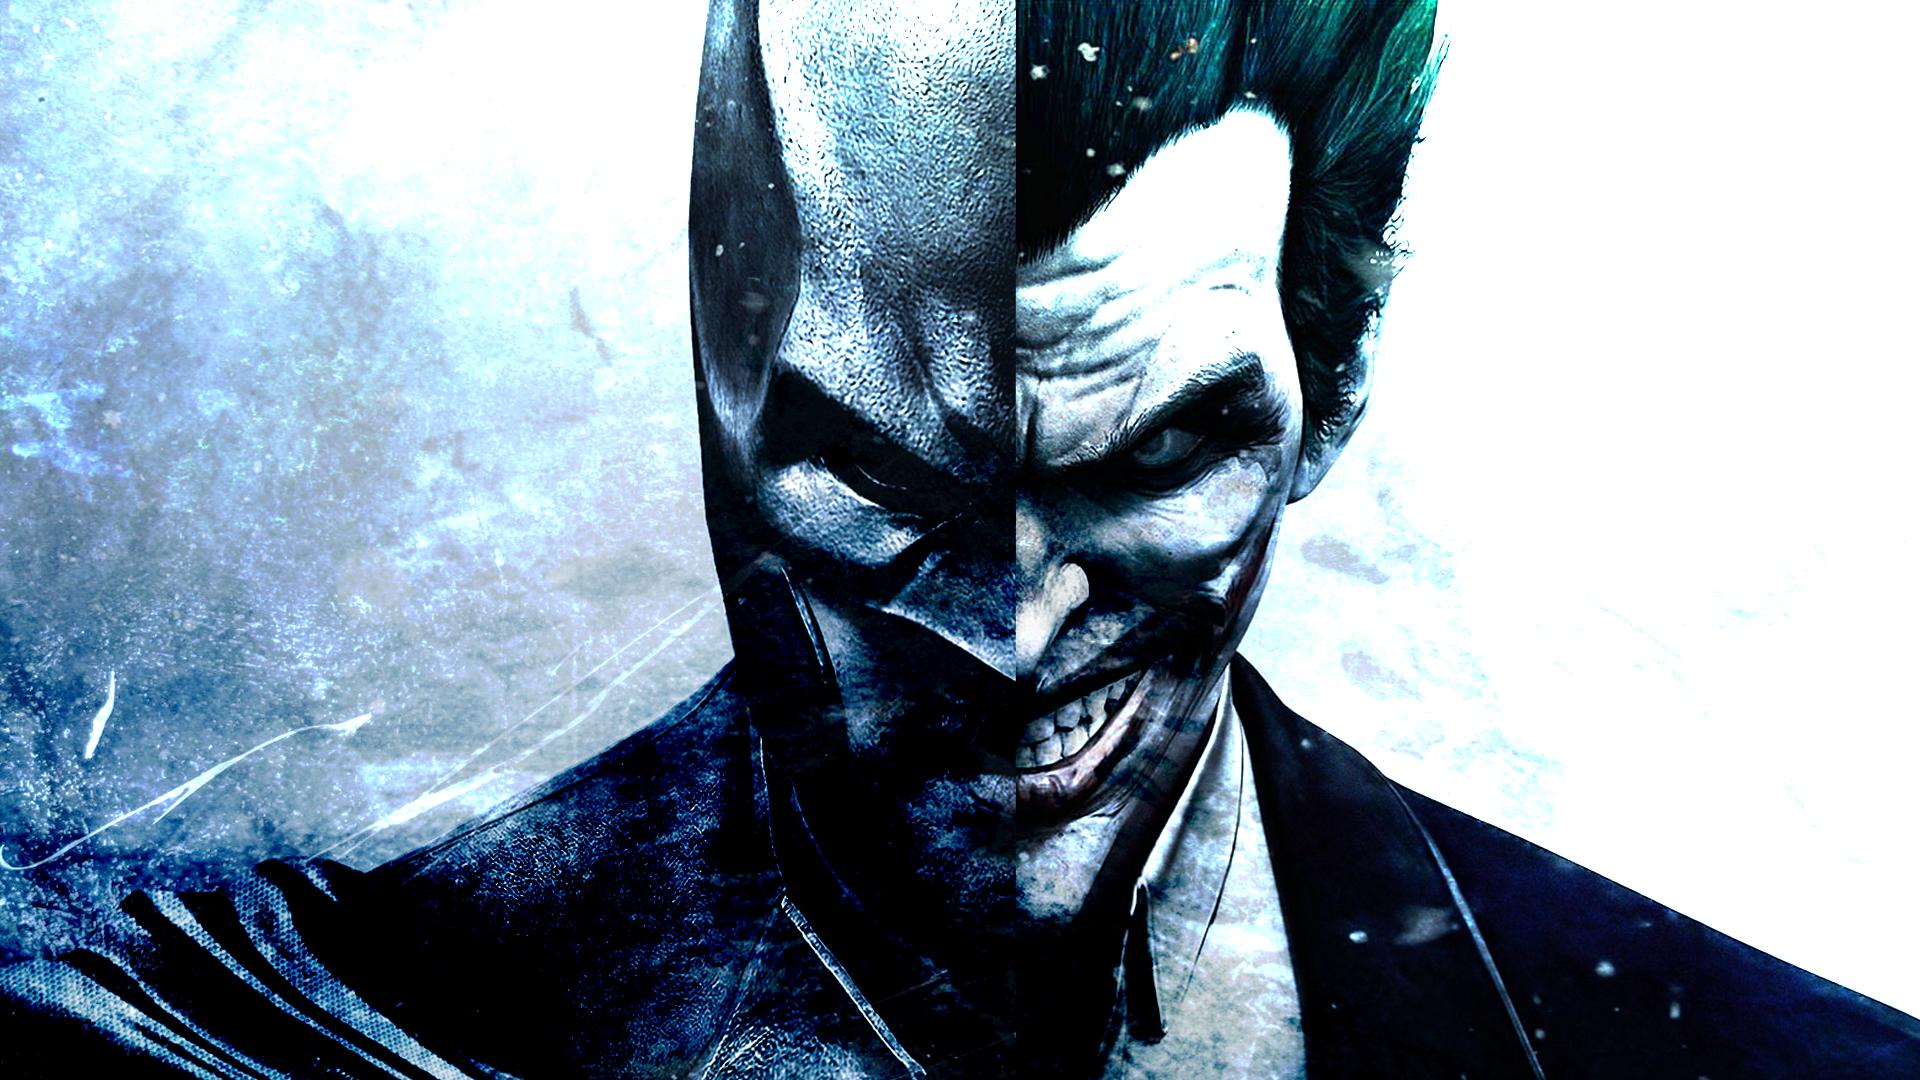 Batman Wallpaper - Batman VS Joker Ver3 by eziocaval on DeviantArt